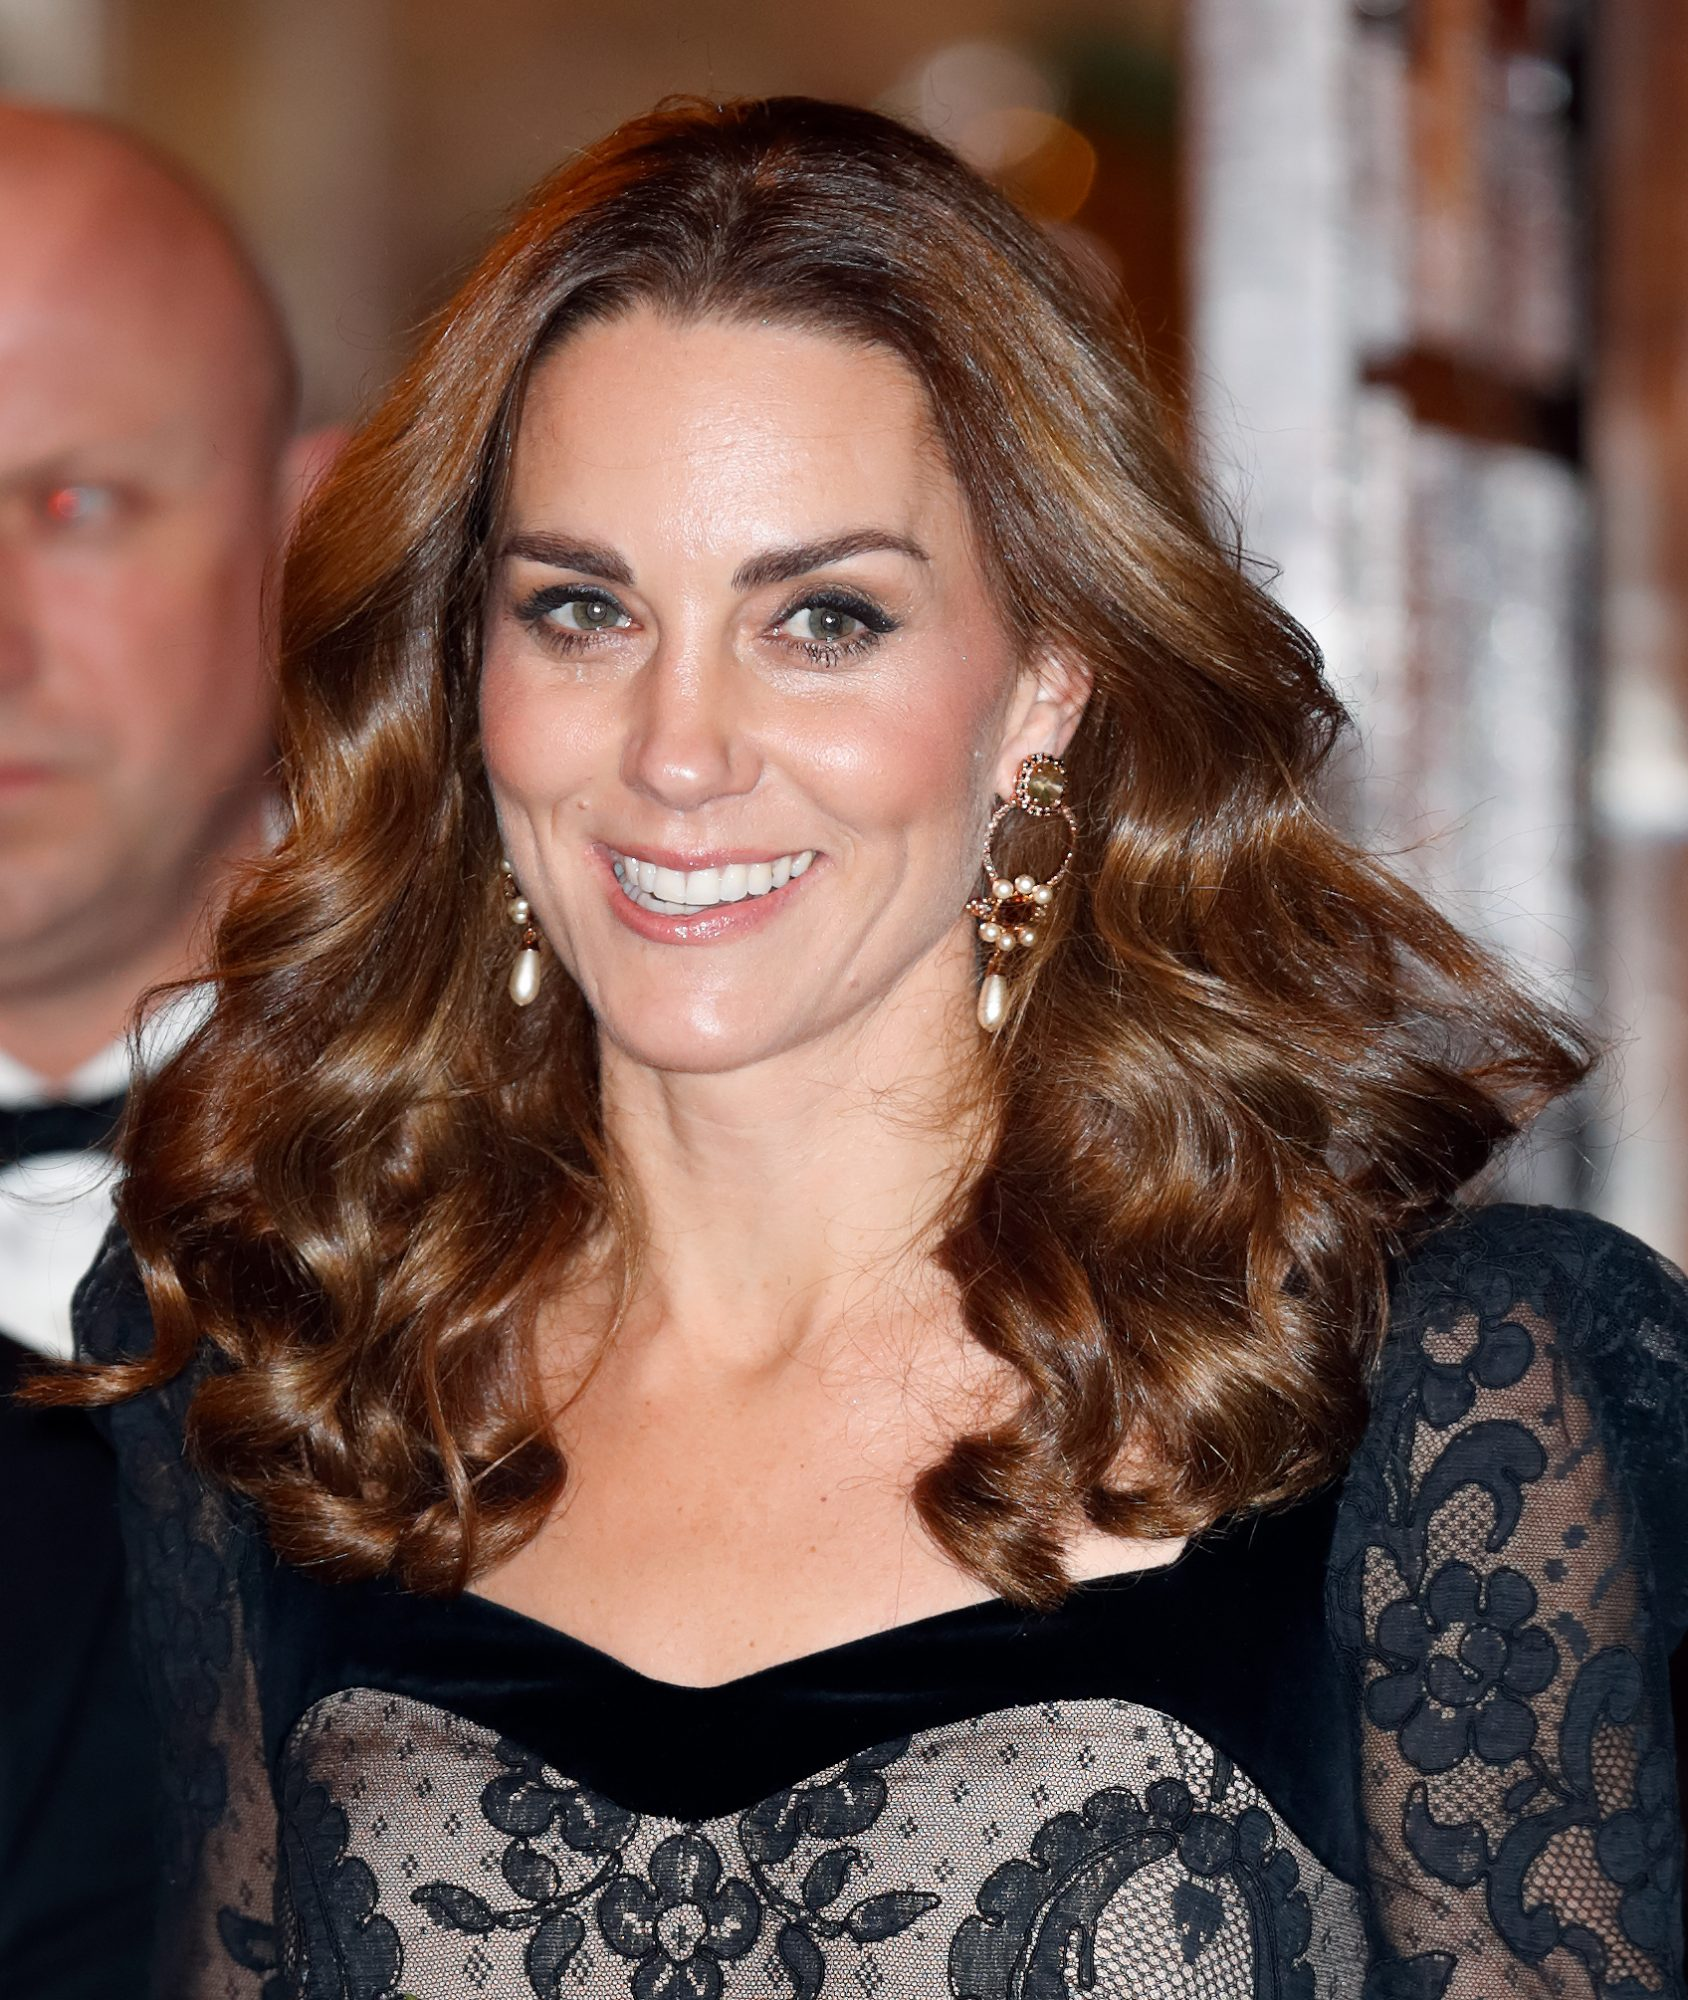 Kate Middleton, realeza, belleza, look, cabello, pelo